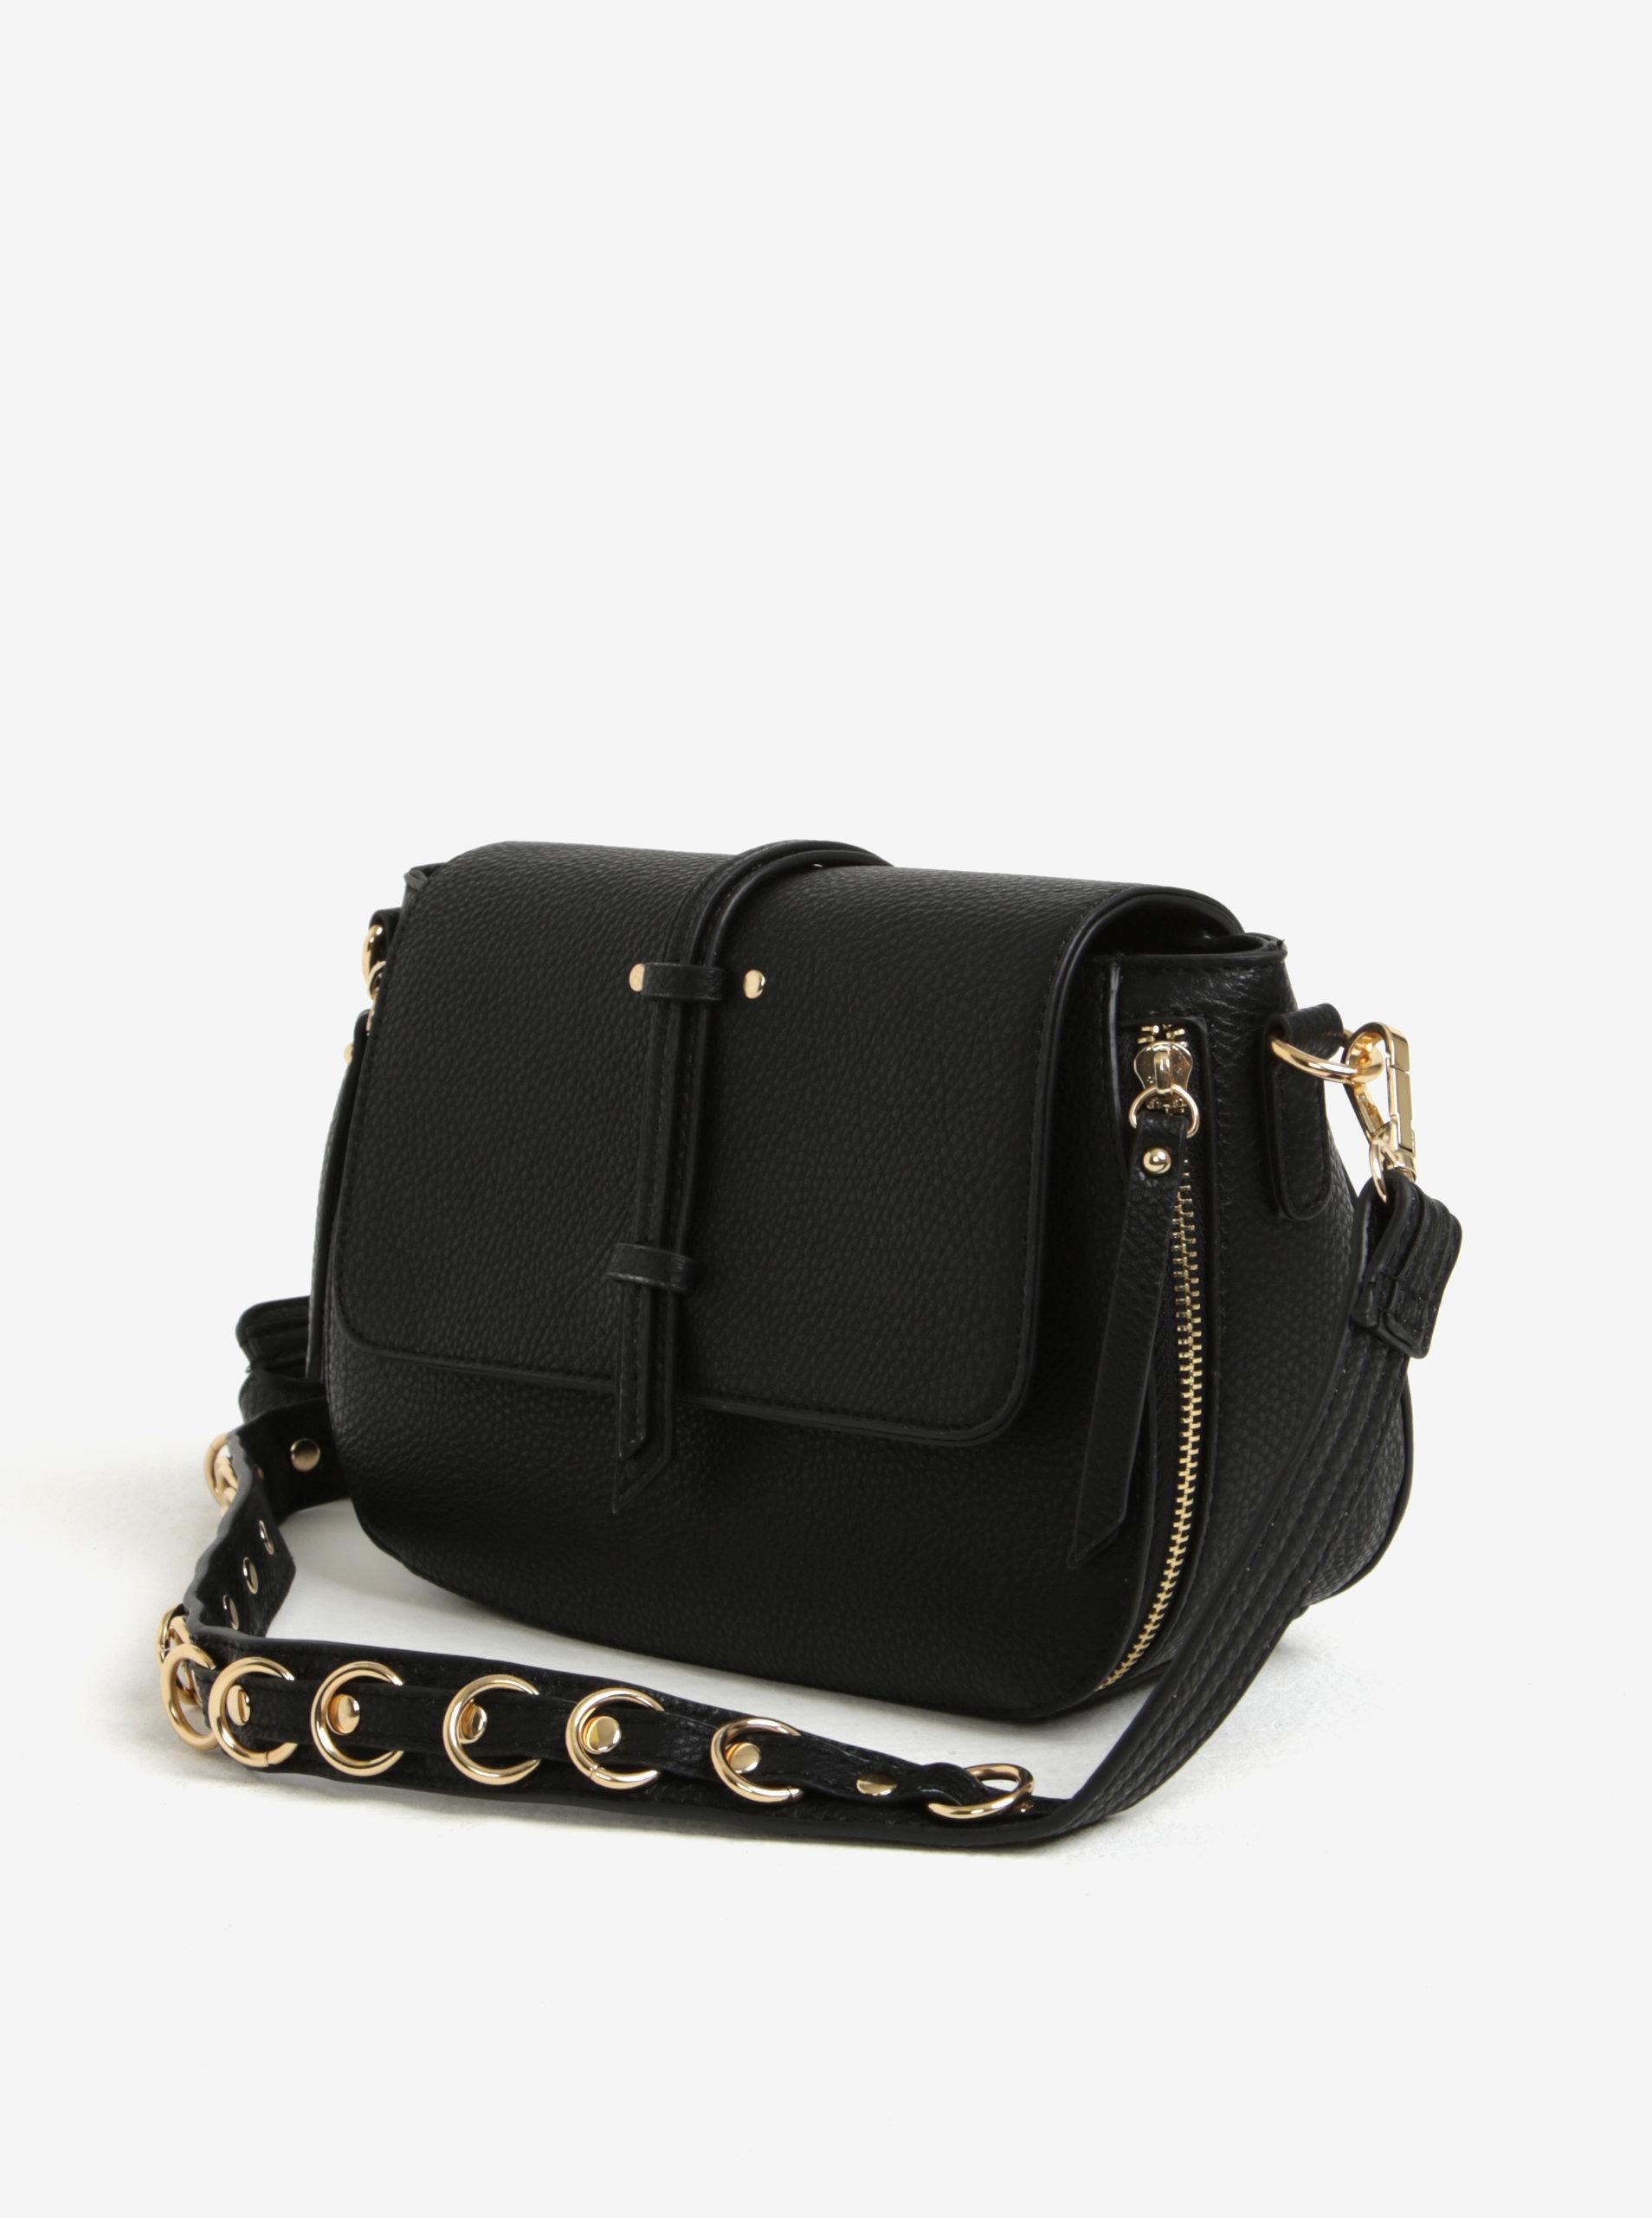 Čierna crossbody kabelka s jemným vzorom Bessie London ... 9da1990adde